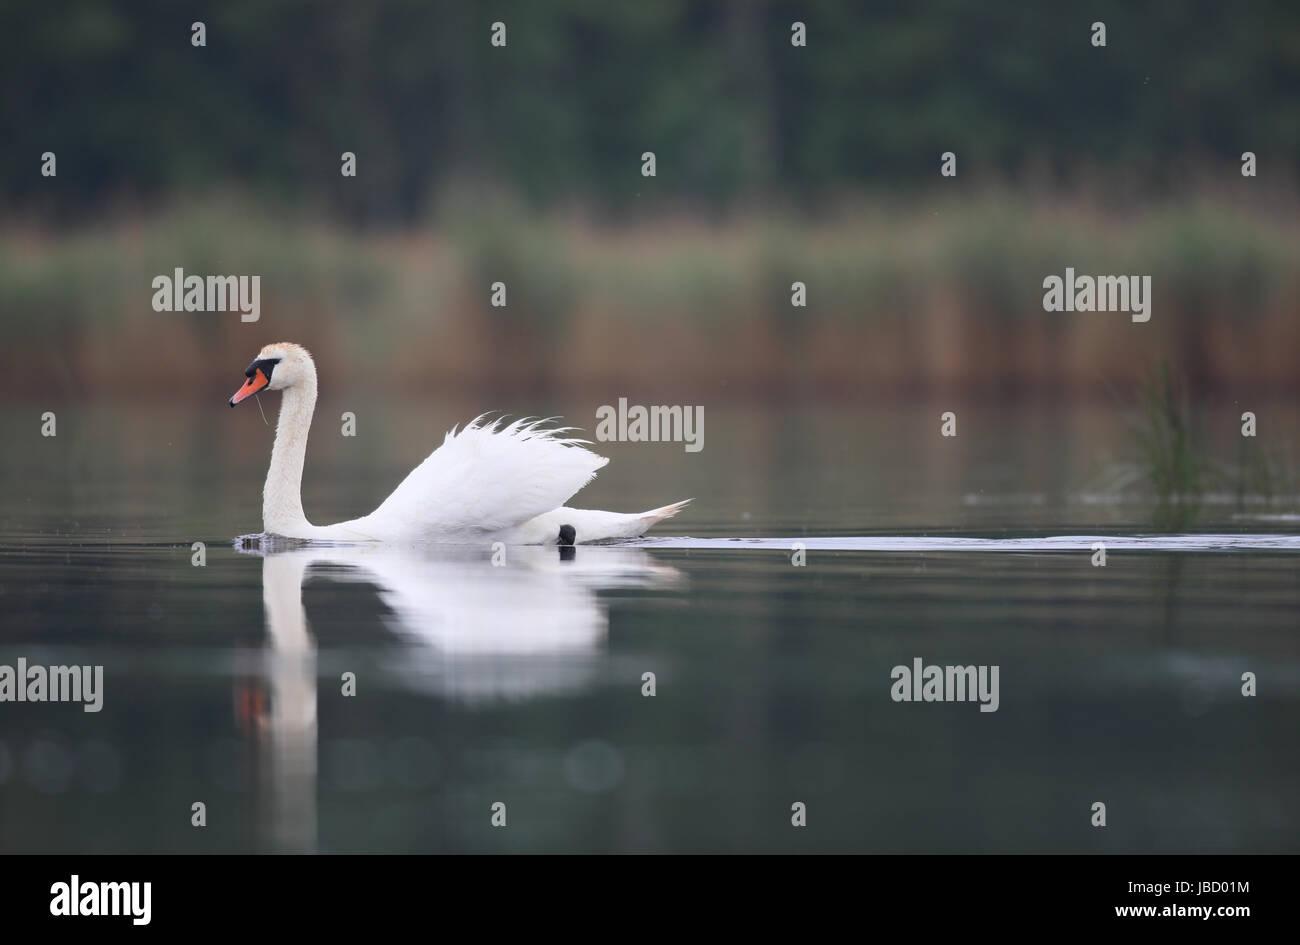 Mute swan (Cygnus olor) swimming on lake - Stock Image